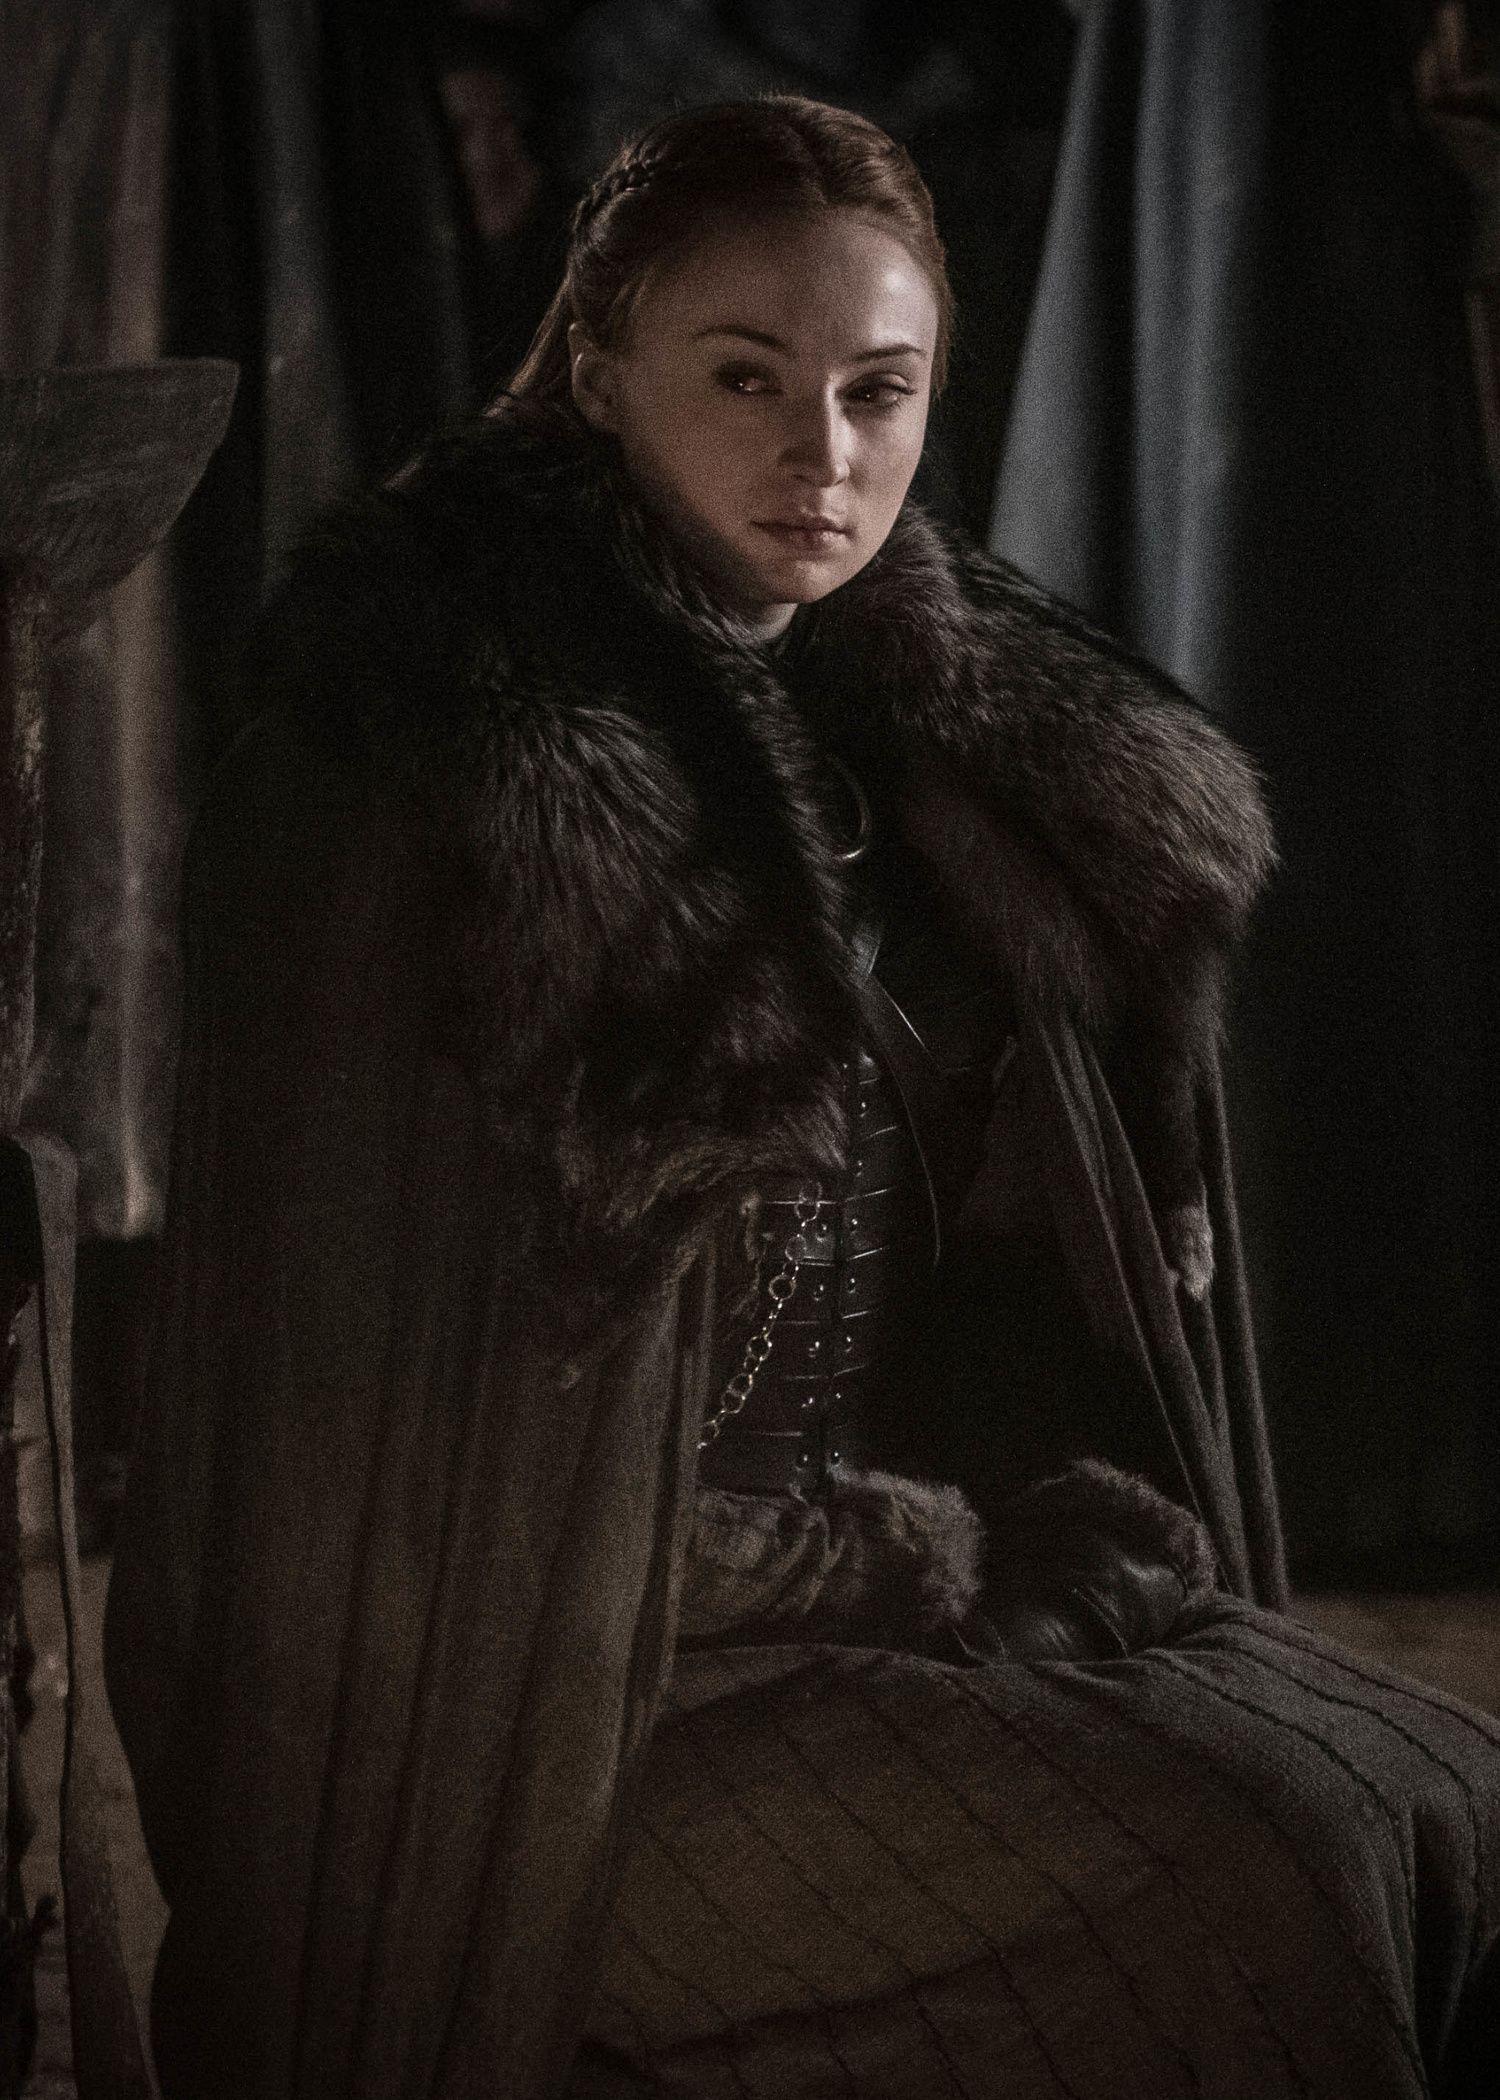 Game Of Thrones Season 6 Episode 4 Streamcloud